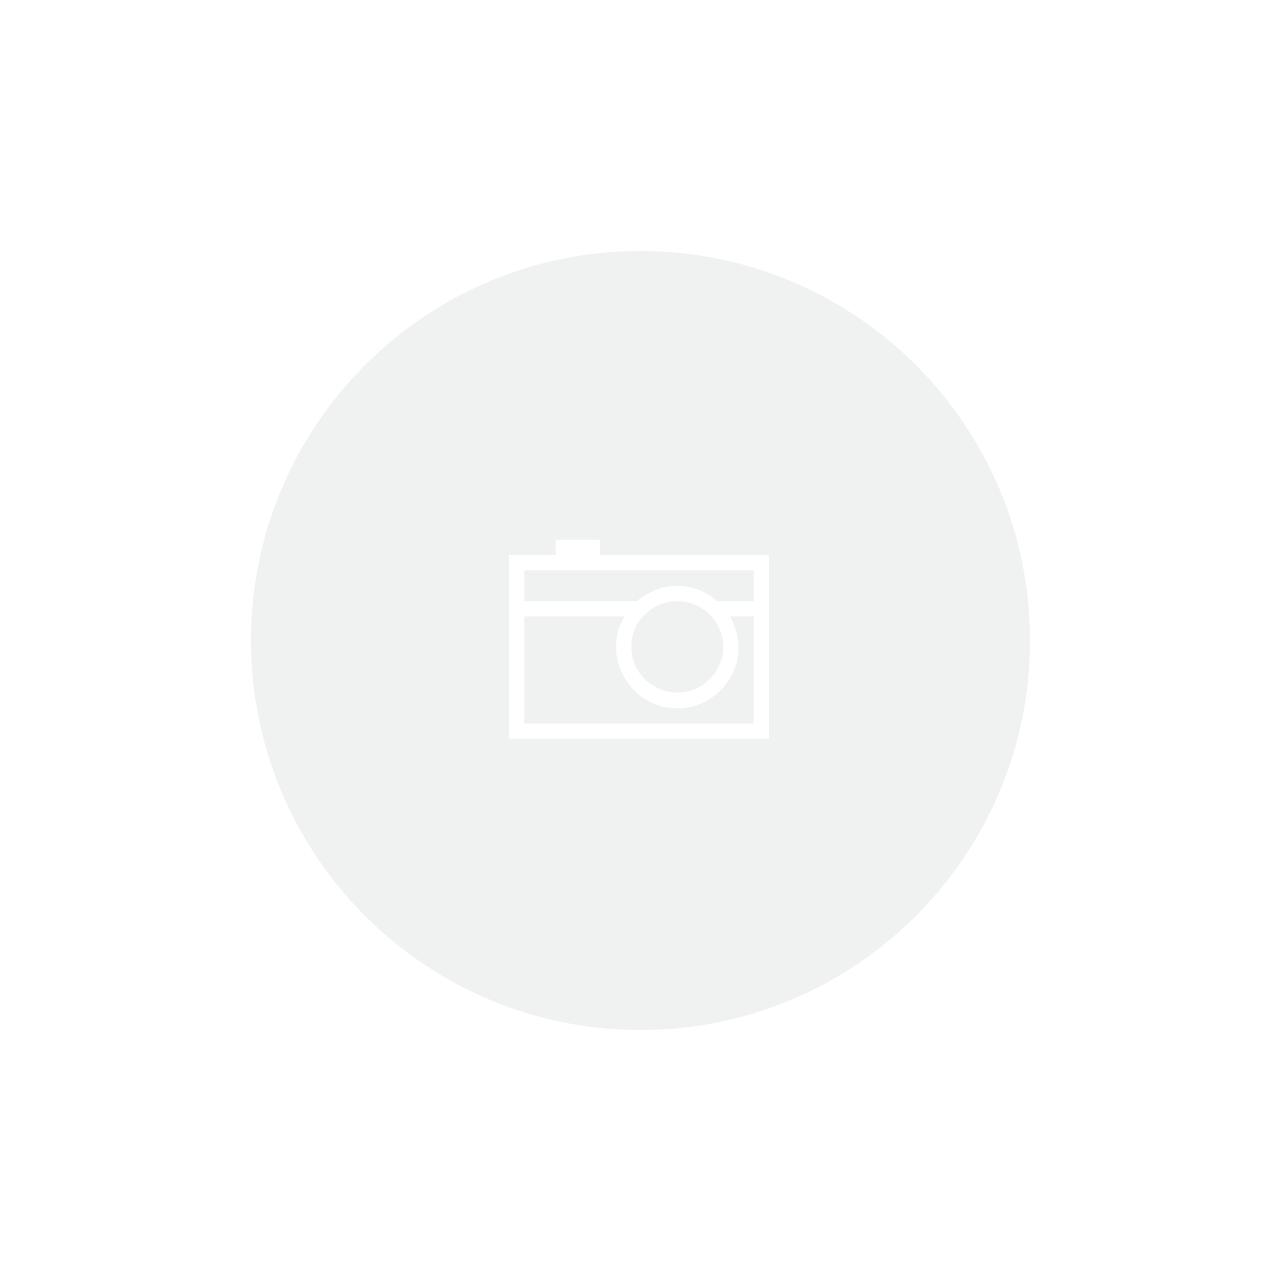 TRANSBIKE THULE PRO RIDE CALHA TETO C/ AJUSTE (598)